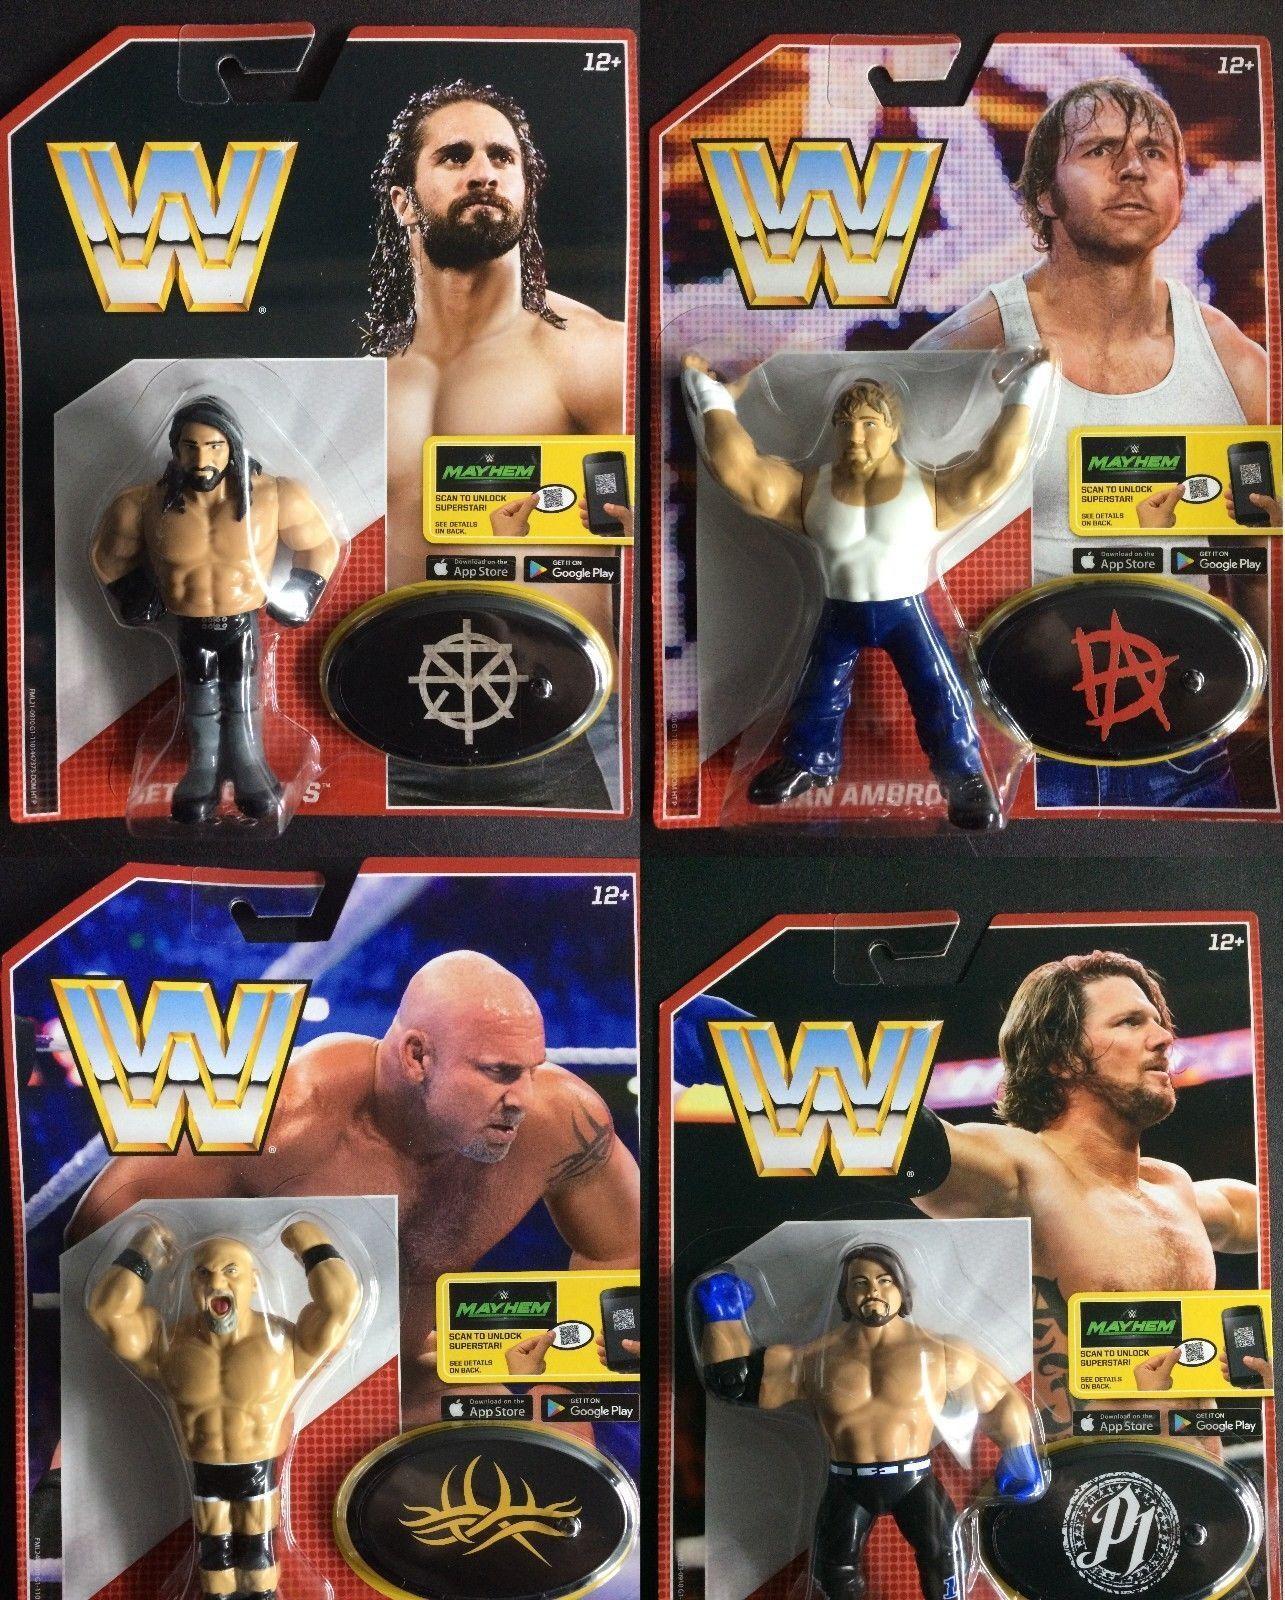 WWE TUTTE E 4 COMPLETO pacchetto MATTEL rétro SERIE 3 ACTION FIGURE WRESTLING